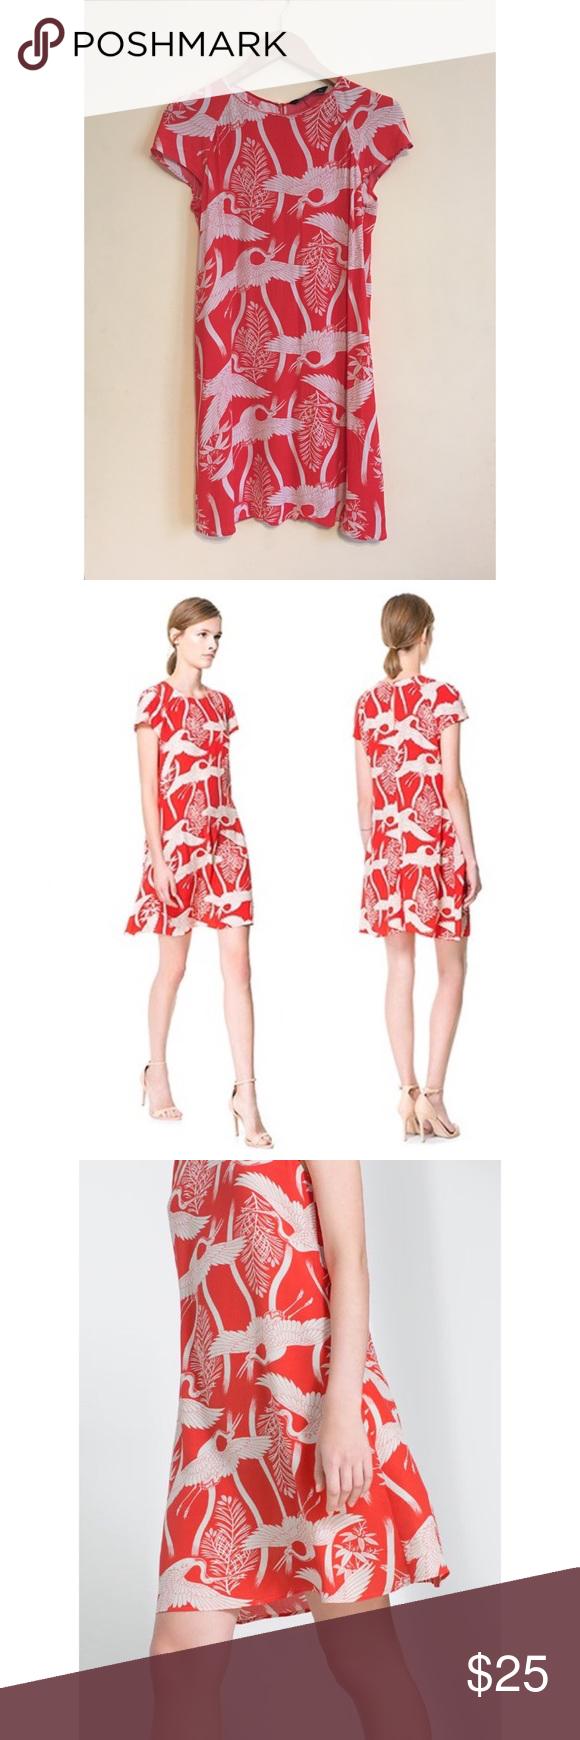 bb0ee03f Zara Printed Orange & White Crane Heron Dress Sm Beautiful Zara ...